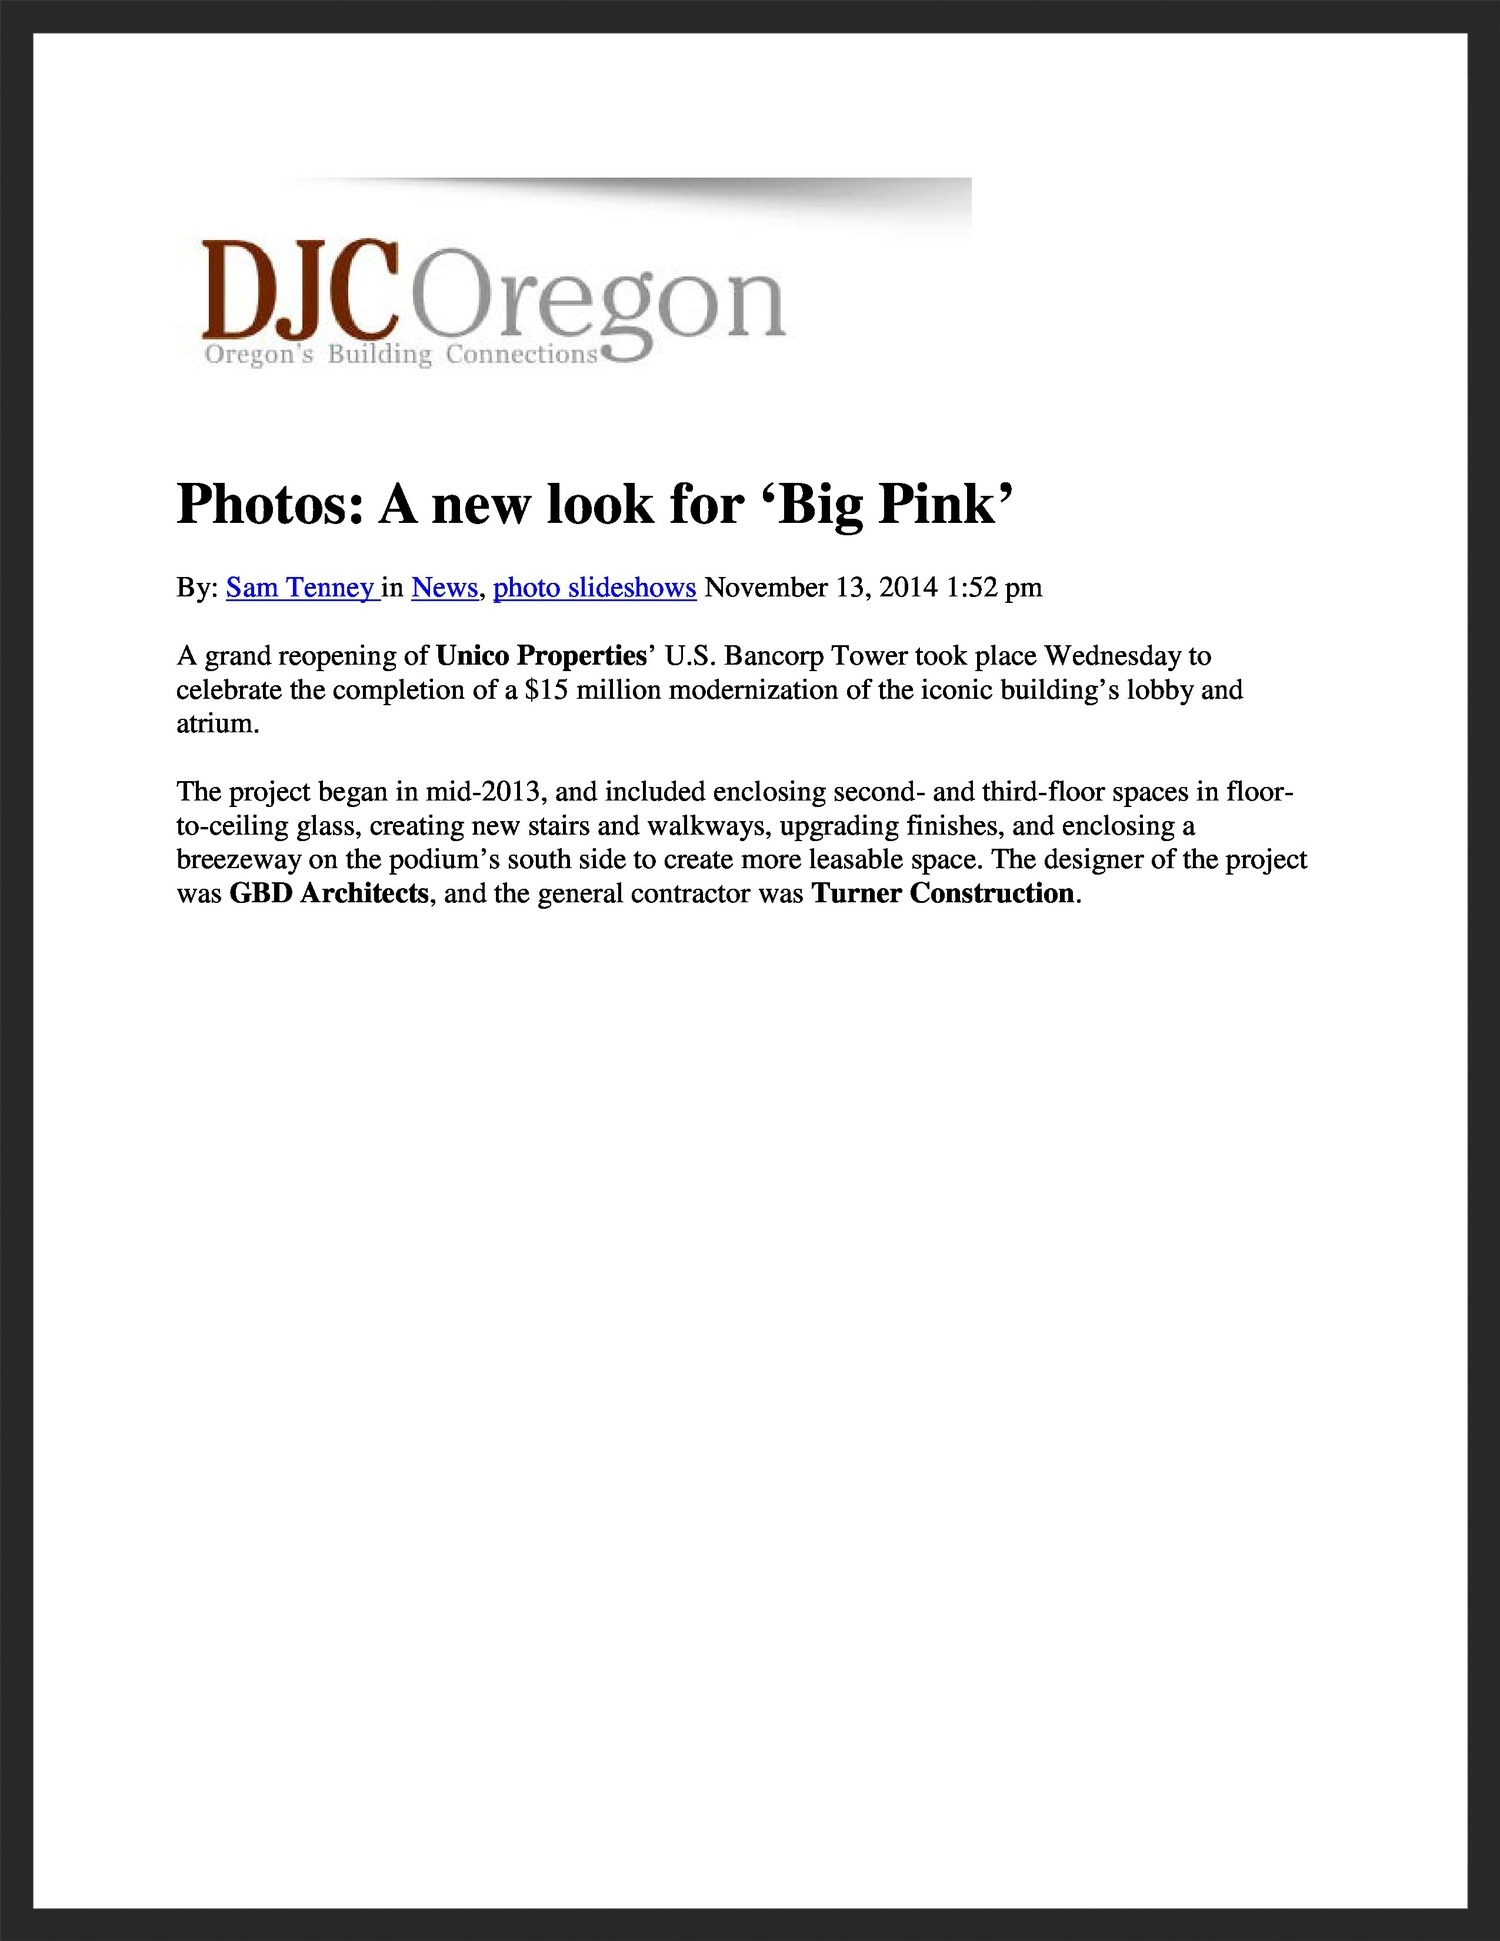 UNICO  DJC Oregon  11.13.2014